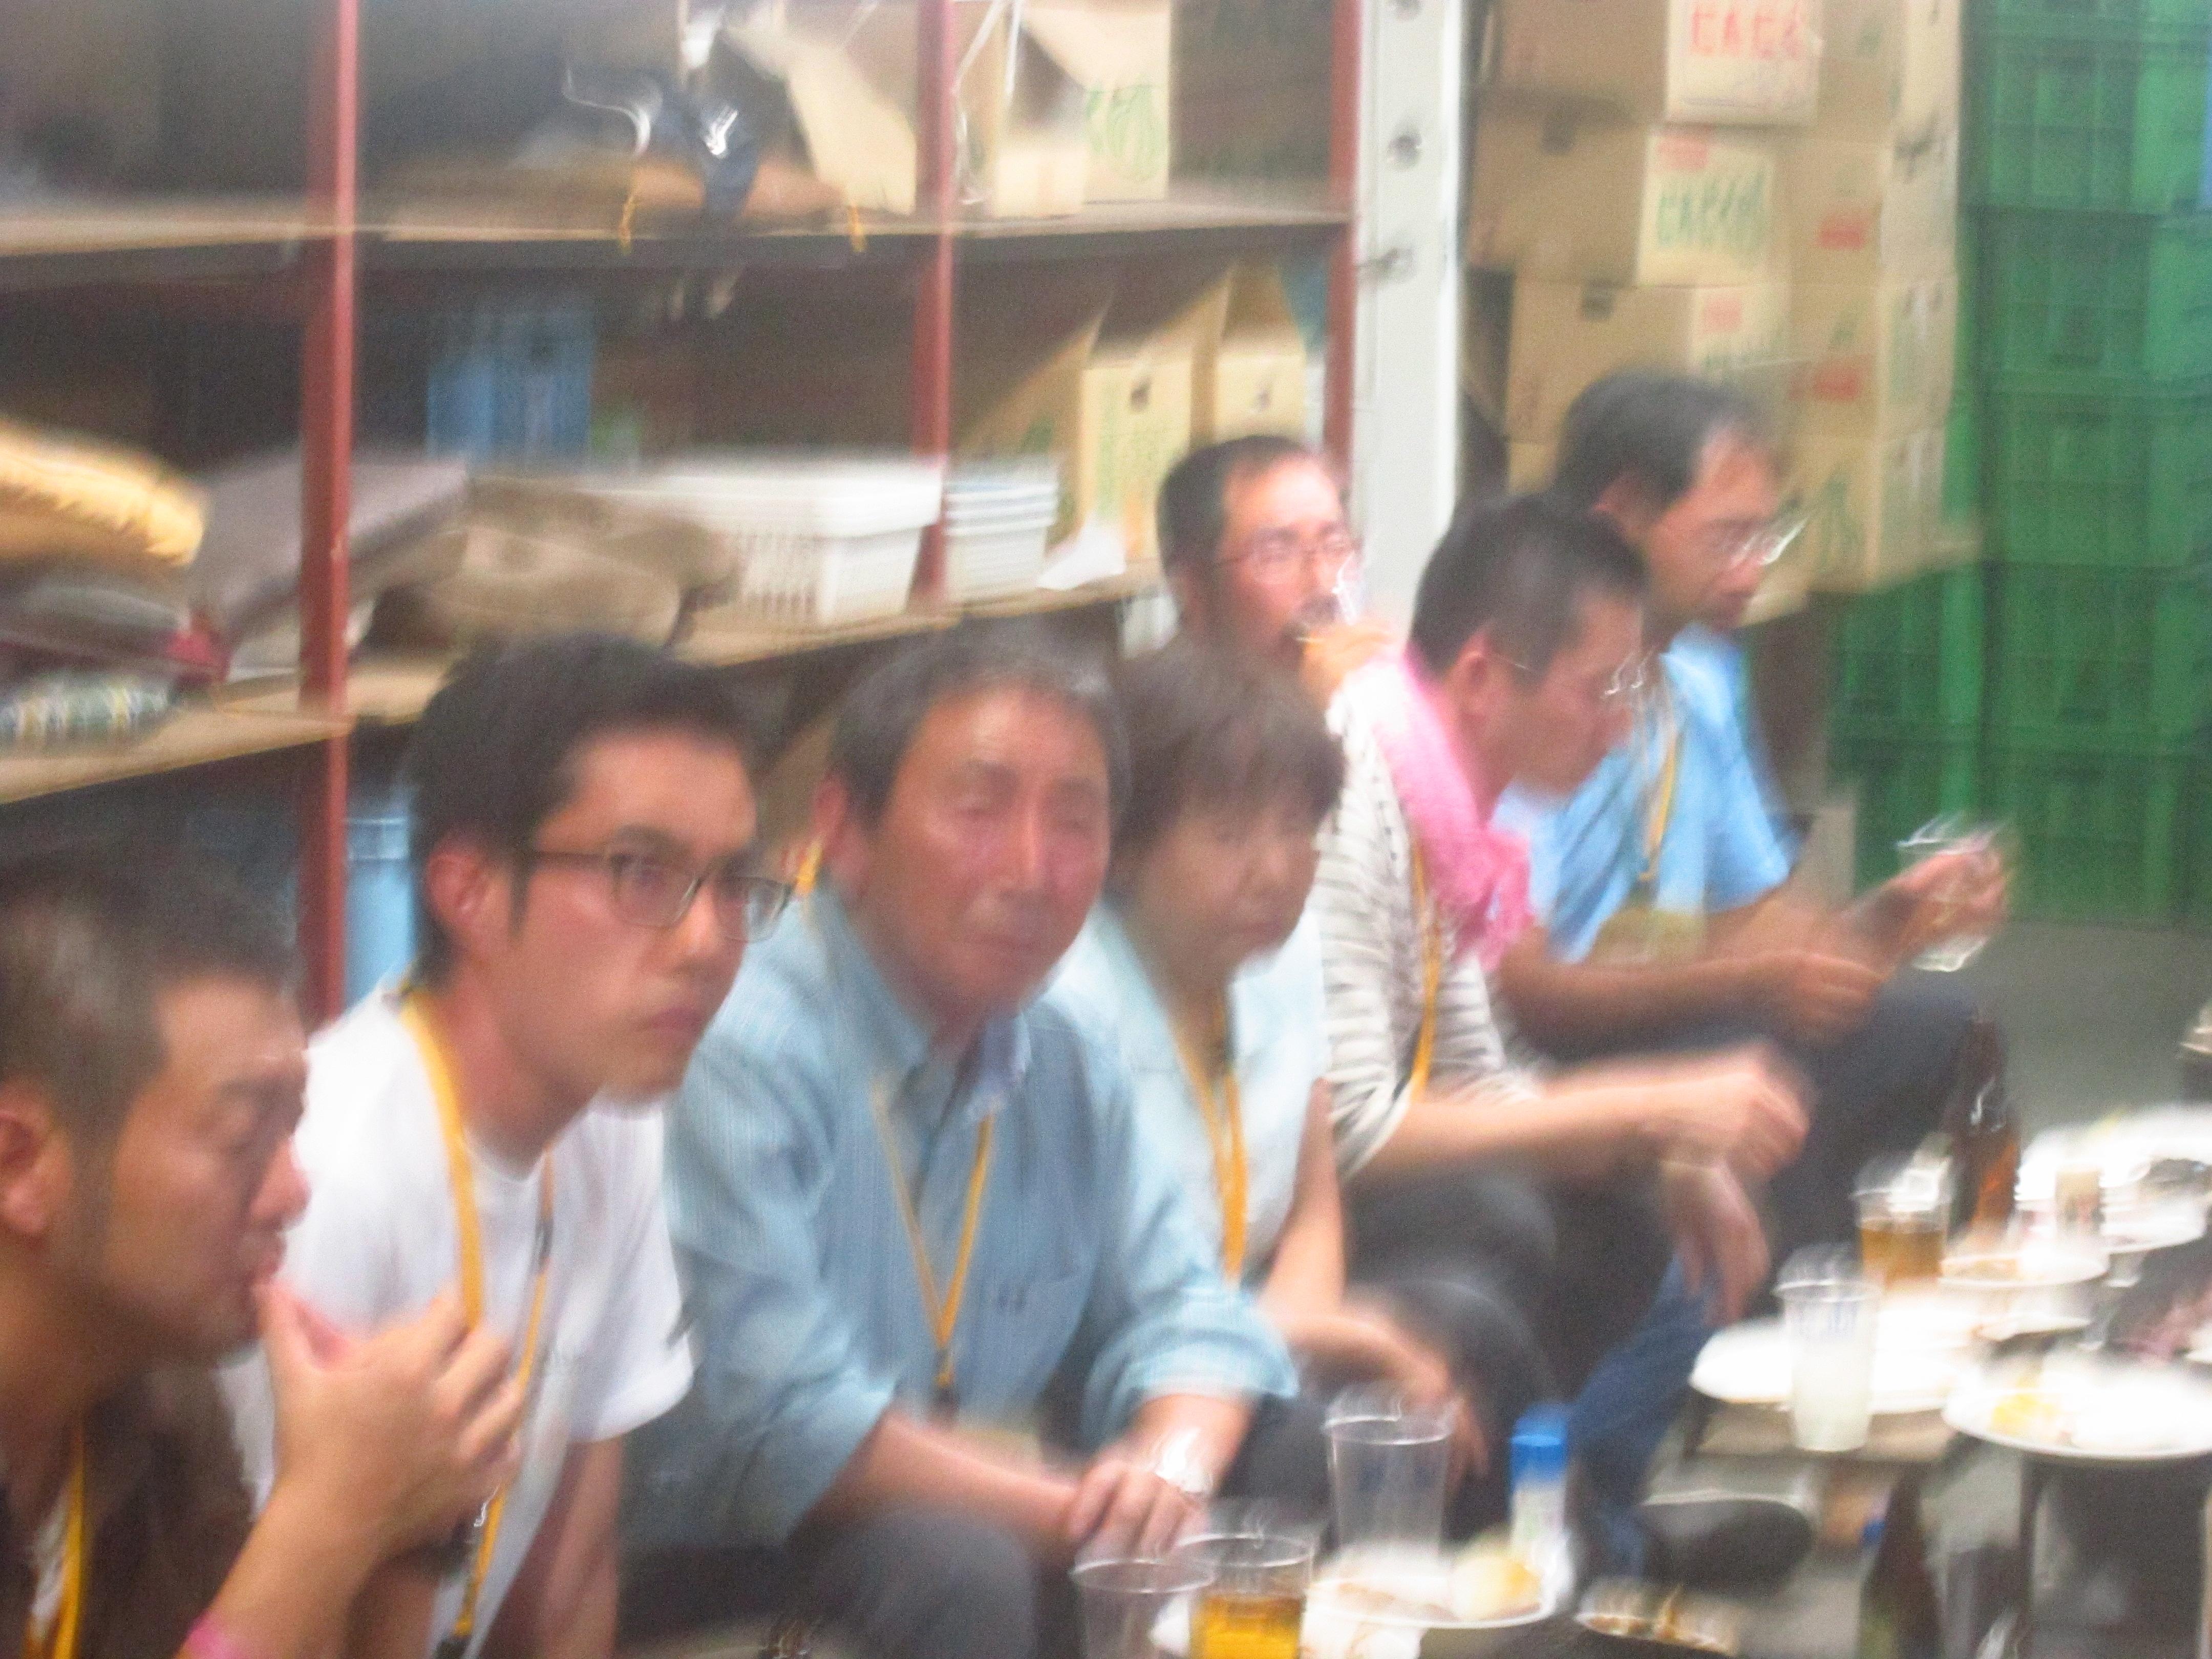 IMG 4350 - 麻布十番納涼祭り25,26日(七戸町出店)